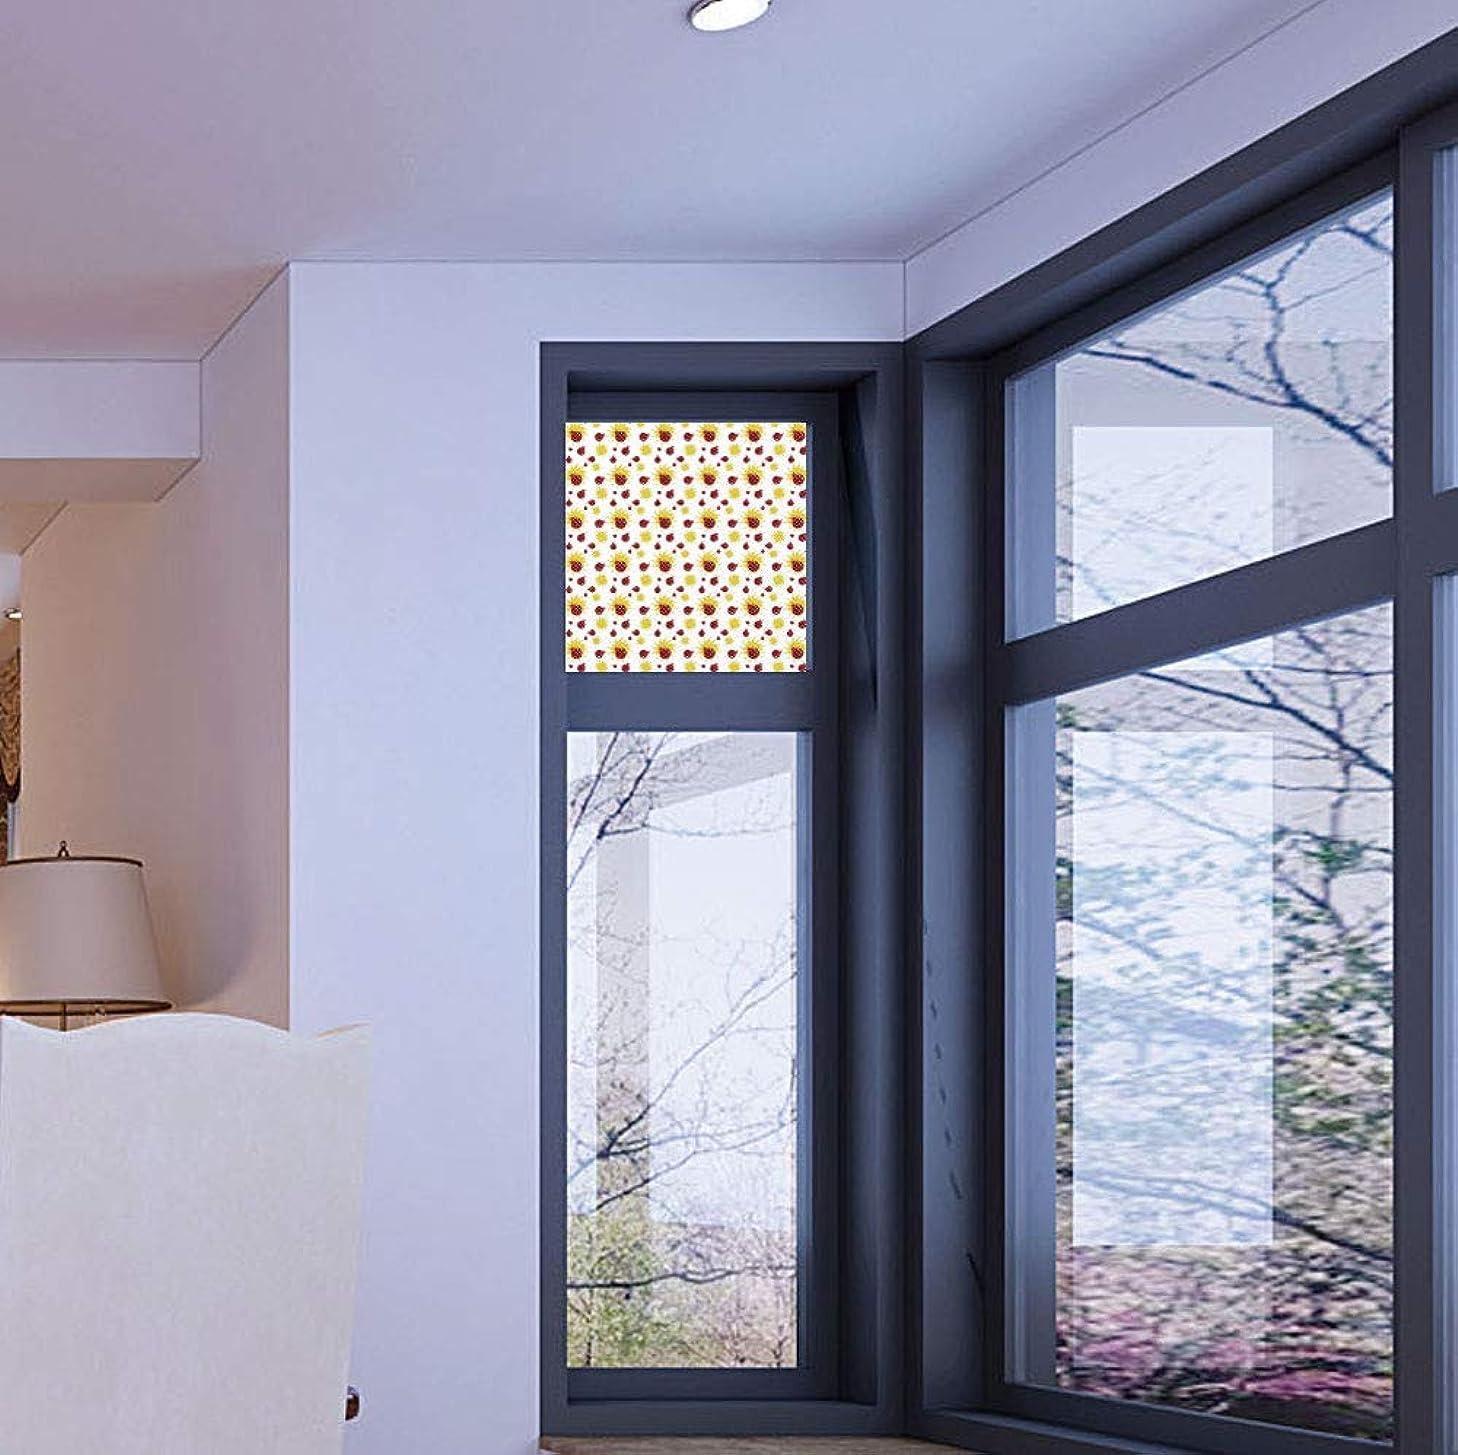 C COABALLA Ethylene Film Printing Design Window Film,Ladybugs,Suitable for Kitchen, Bedroom, Living Room,Summer Season Inspired Sun Pattern Bugs Animal Imagery,17''x24''